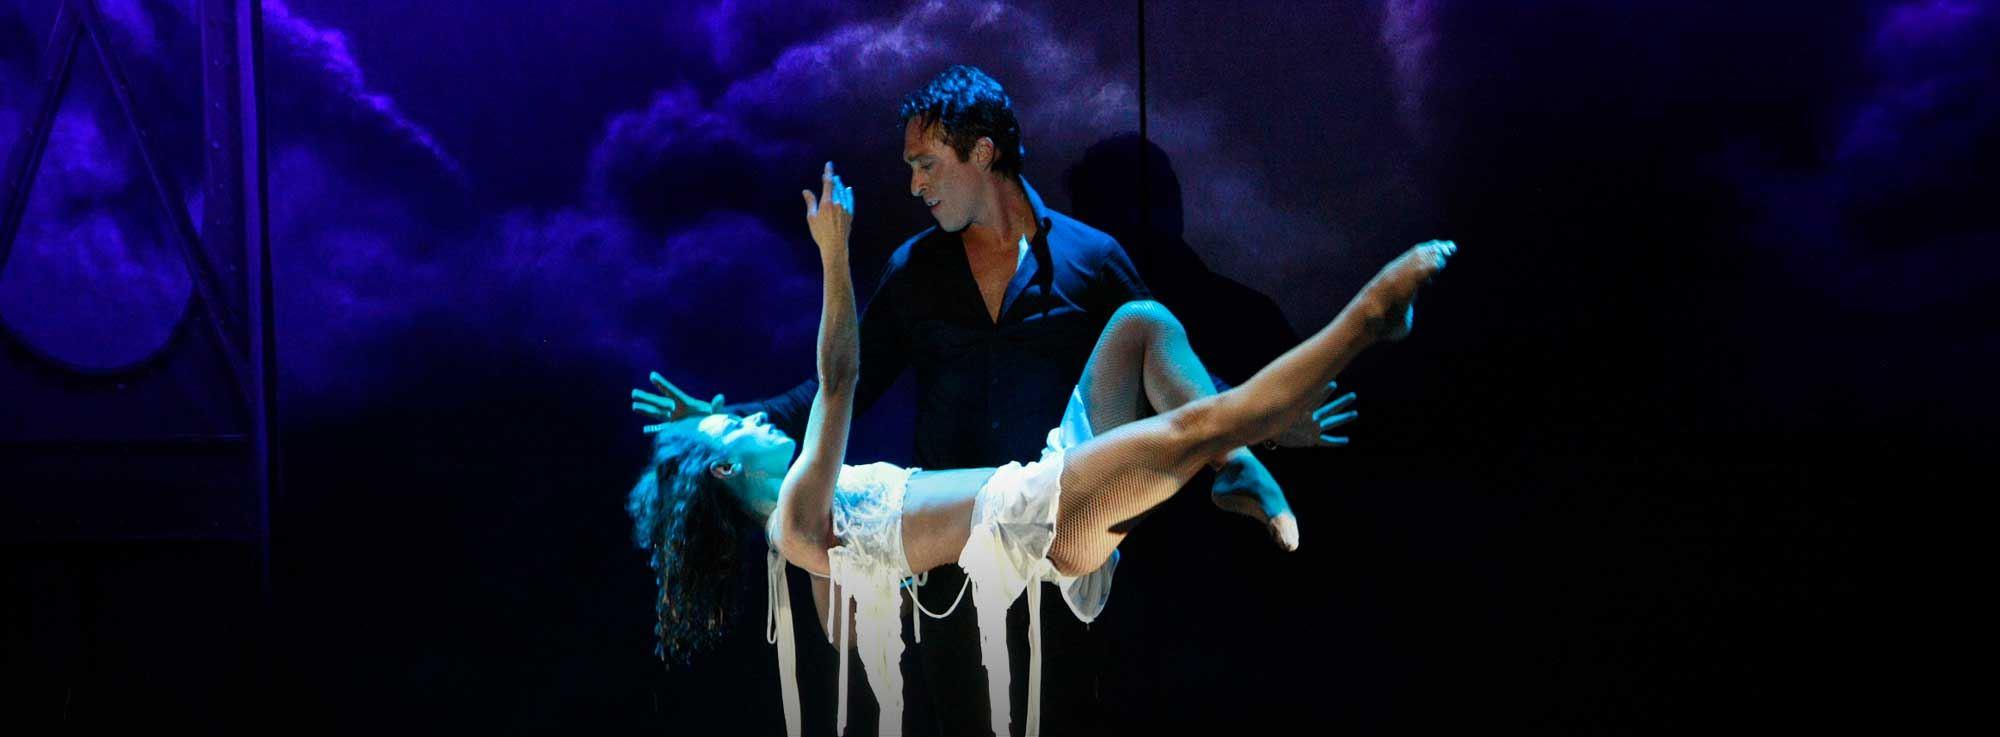 Brindisi: Magic - Gran Galà di illusionismo